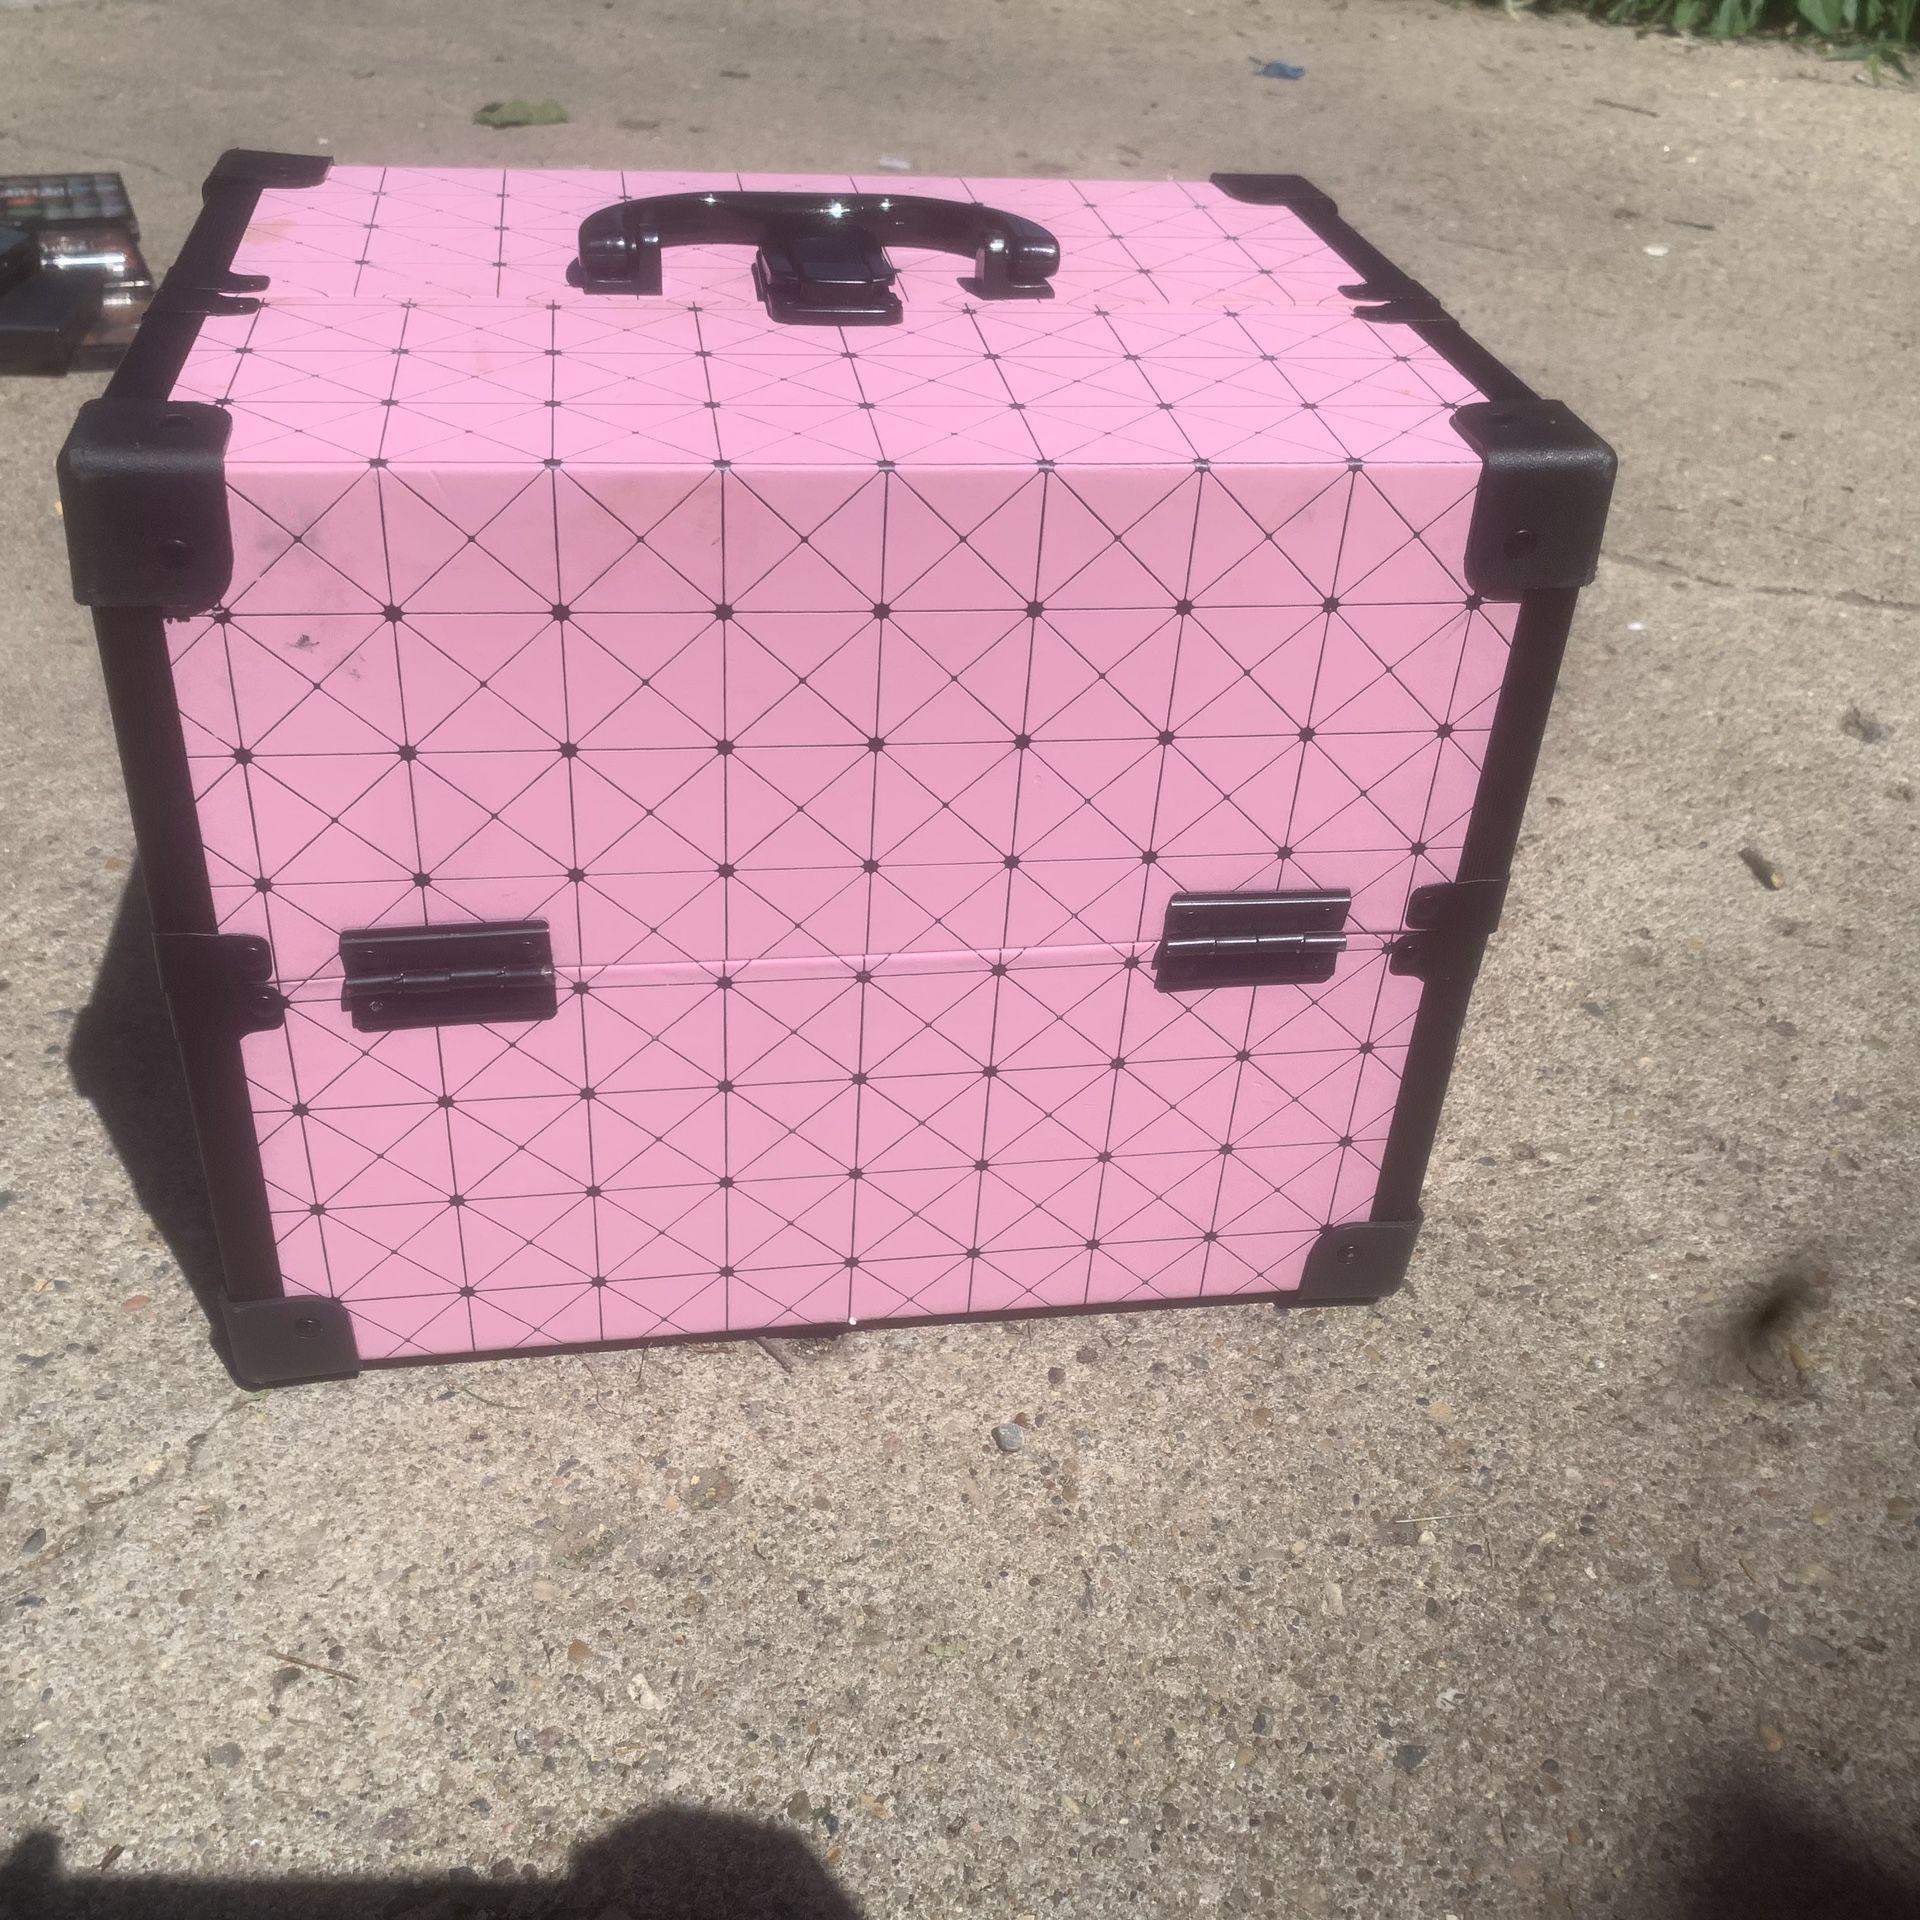 Makeup box with makeup products